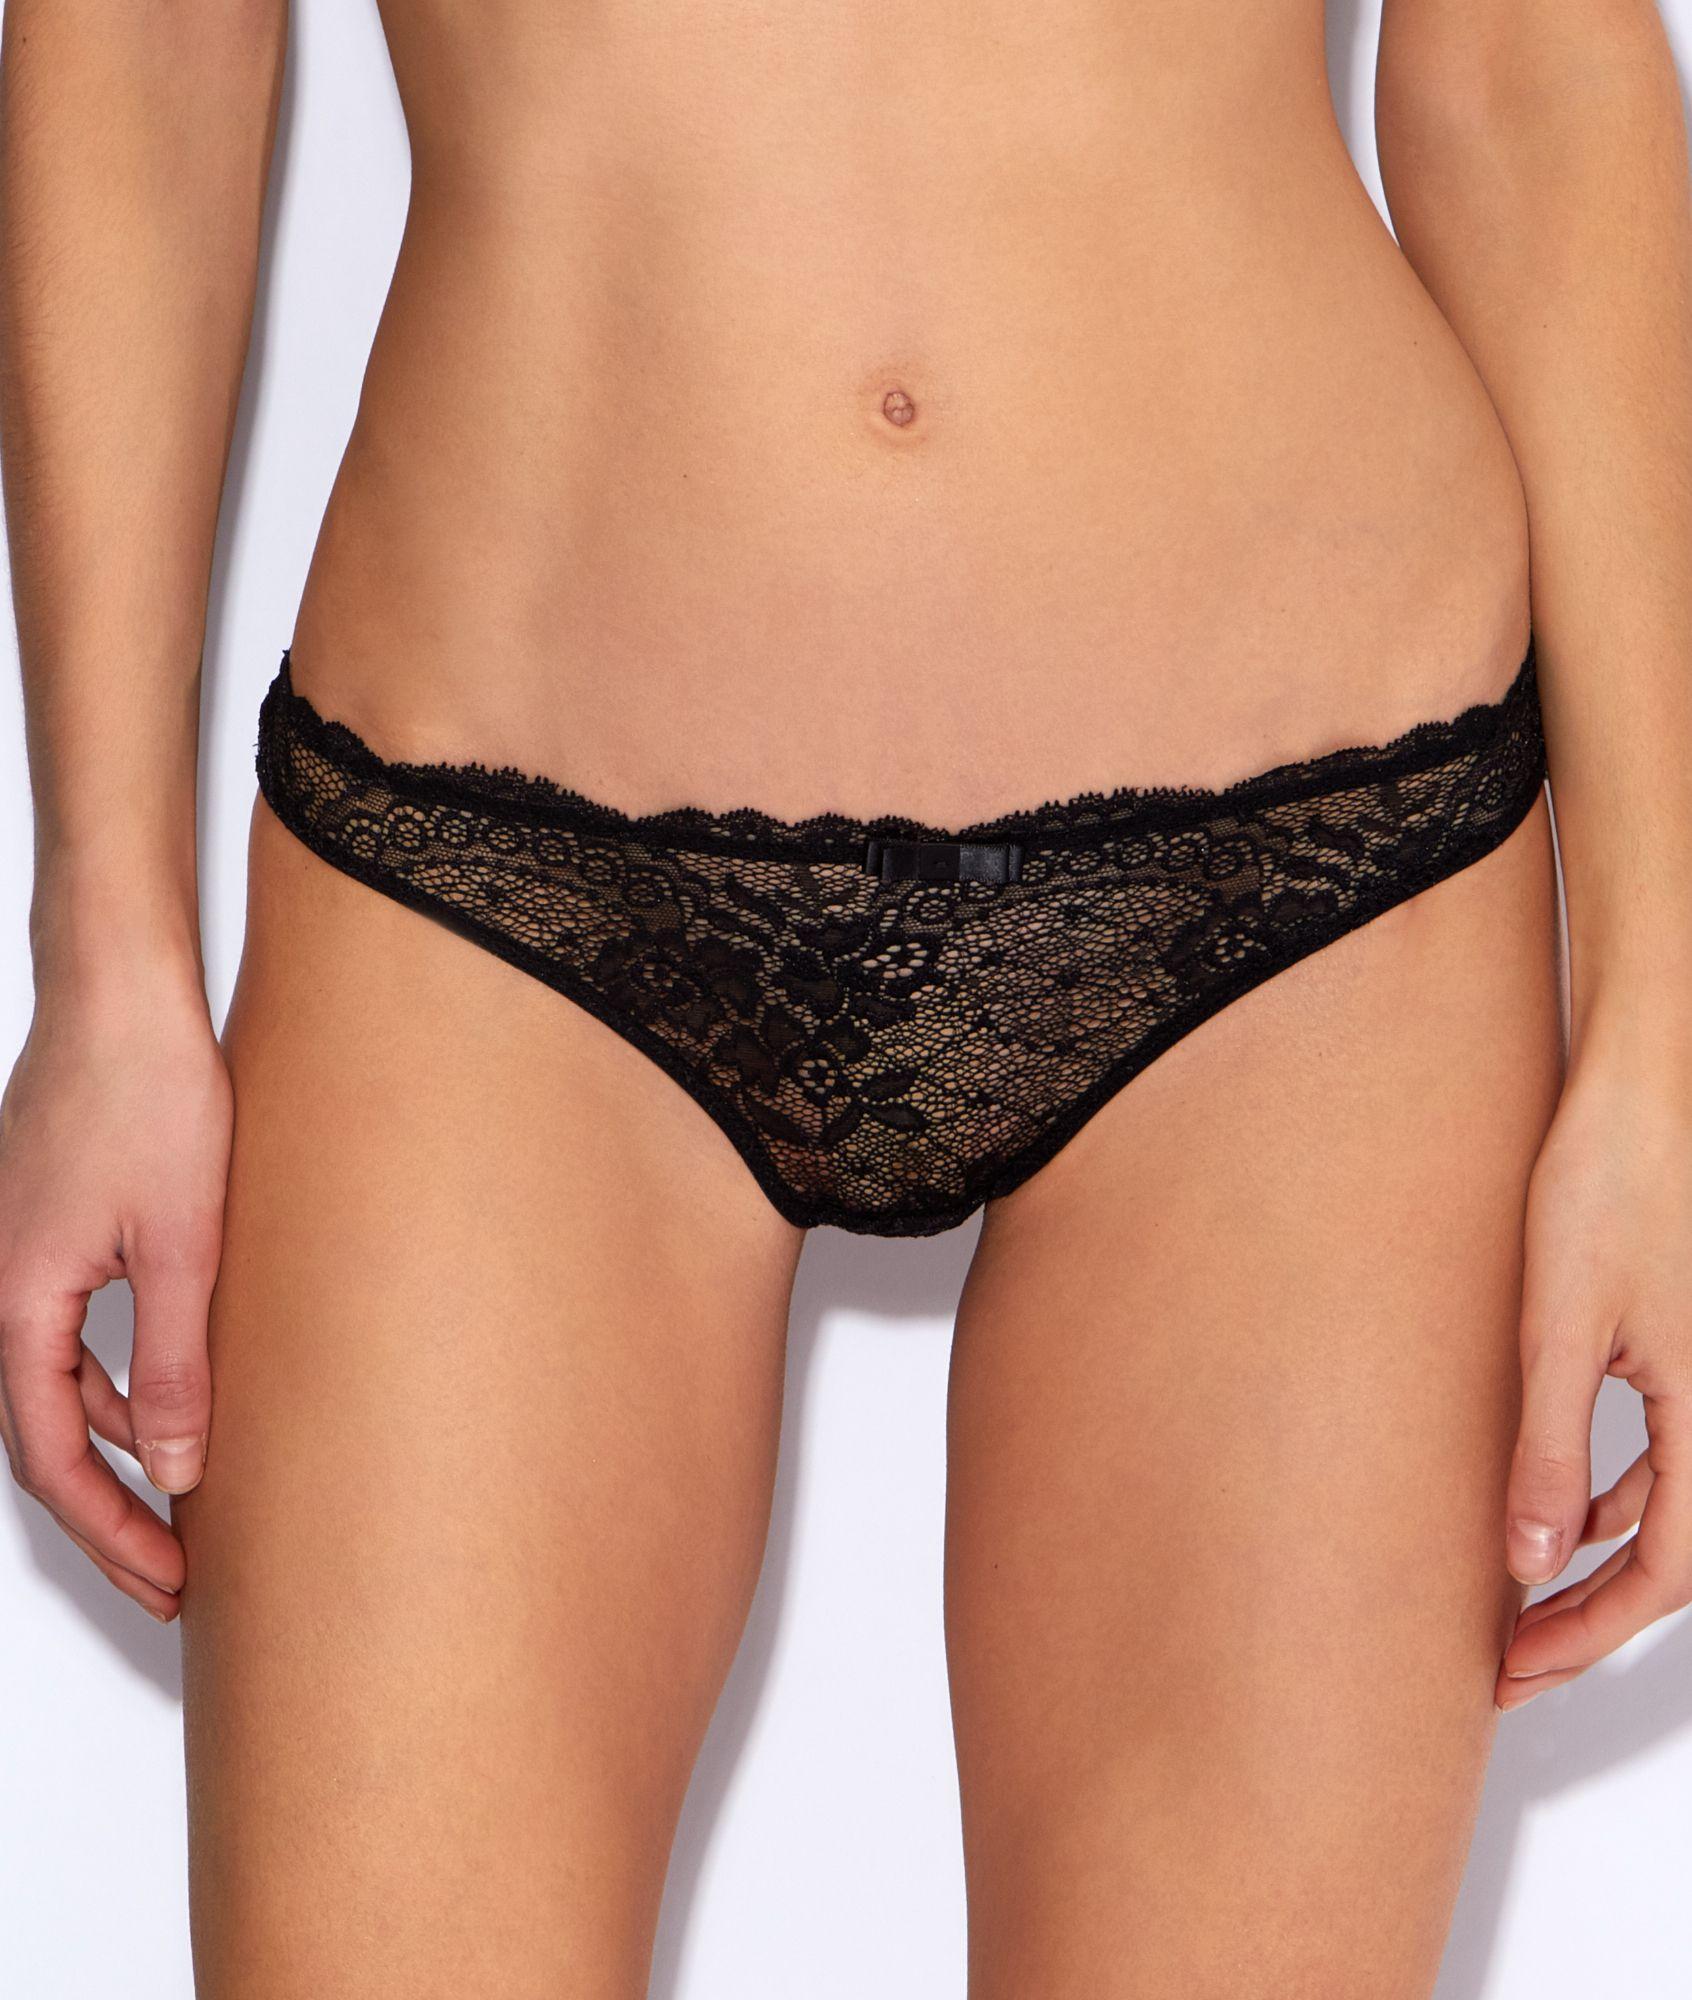 culotte sexe Galerie graisse noir ssbbw porno